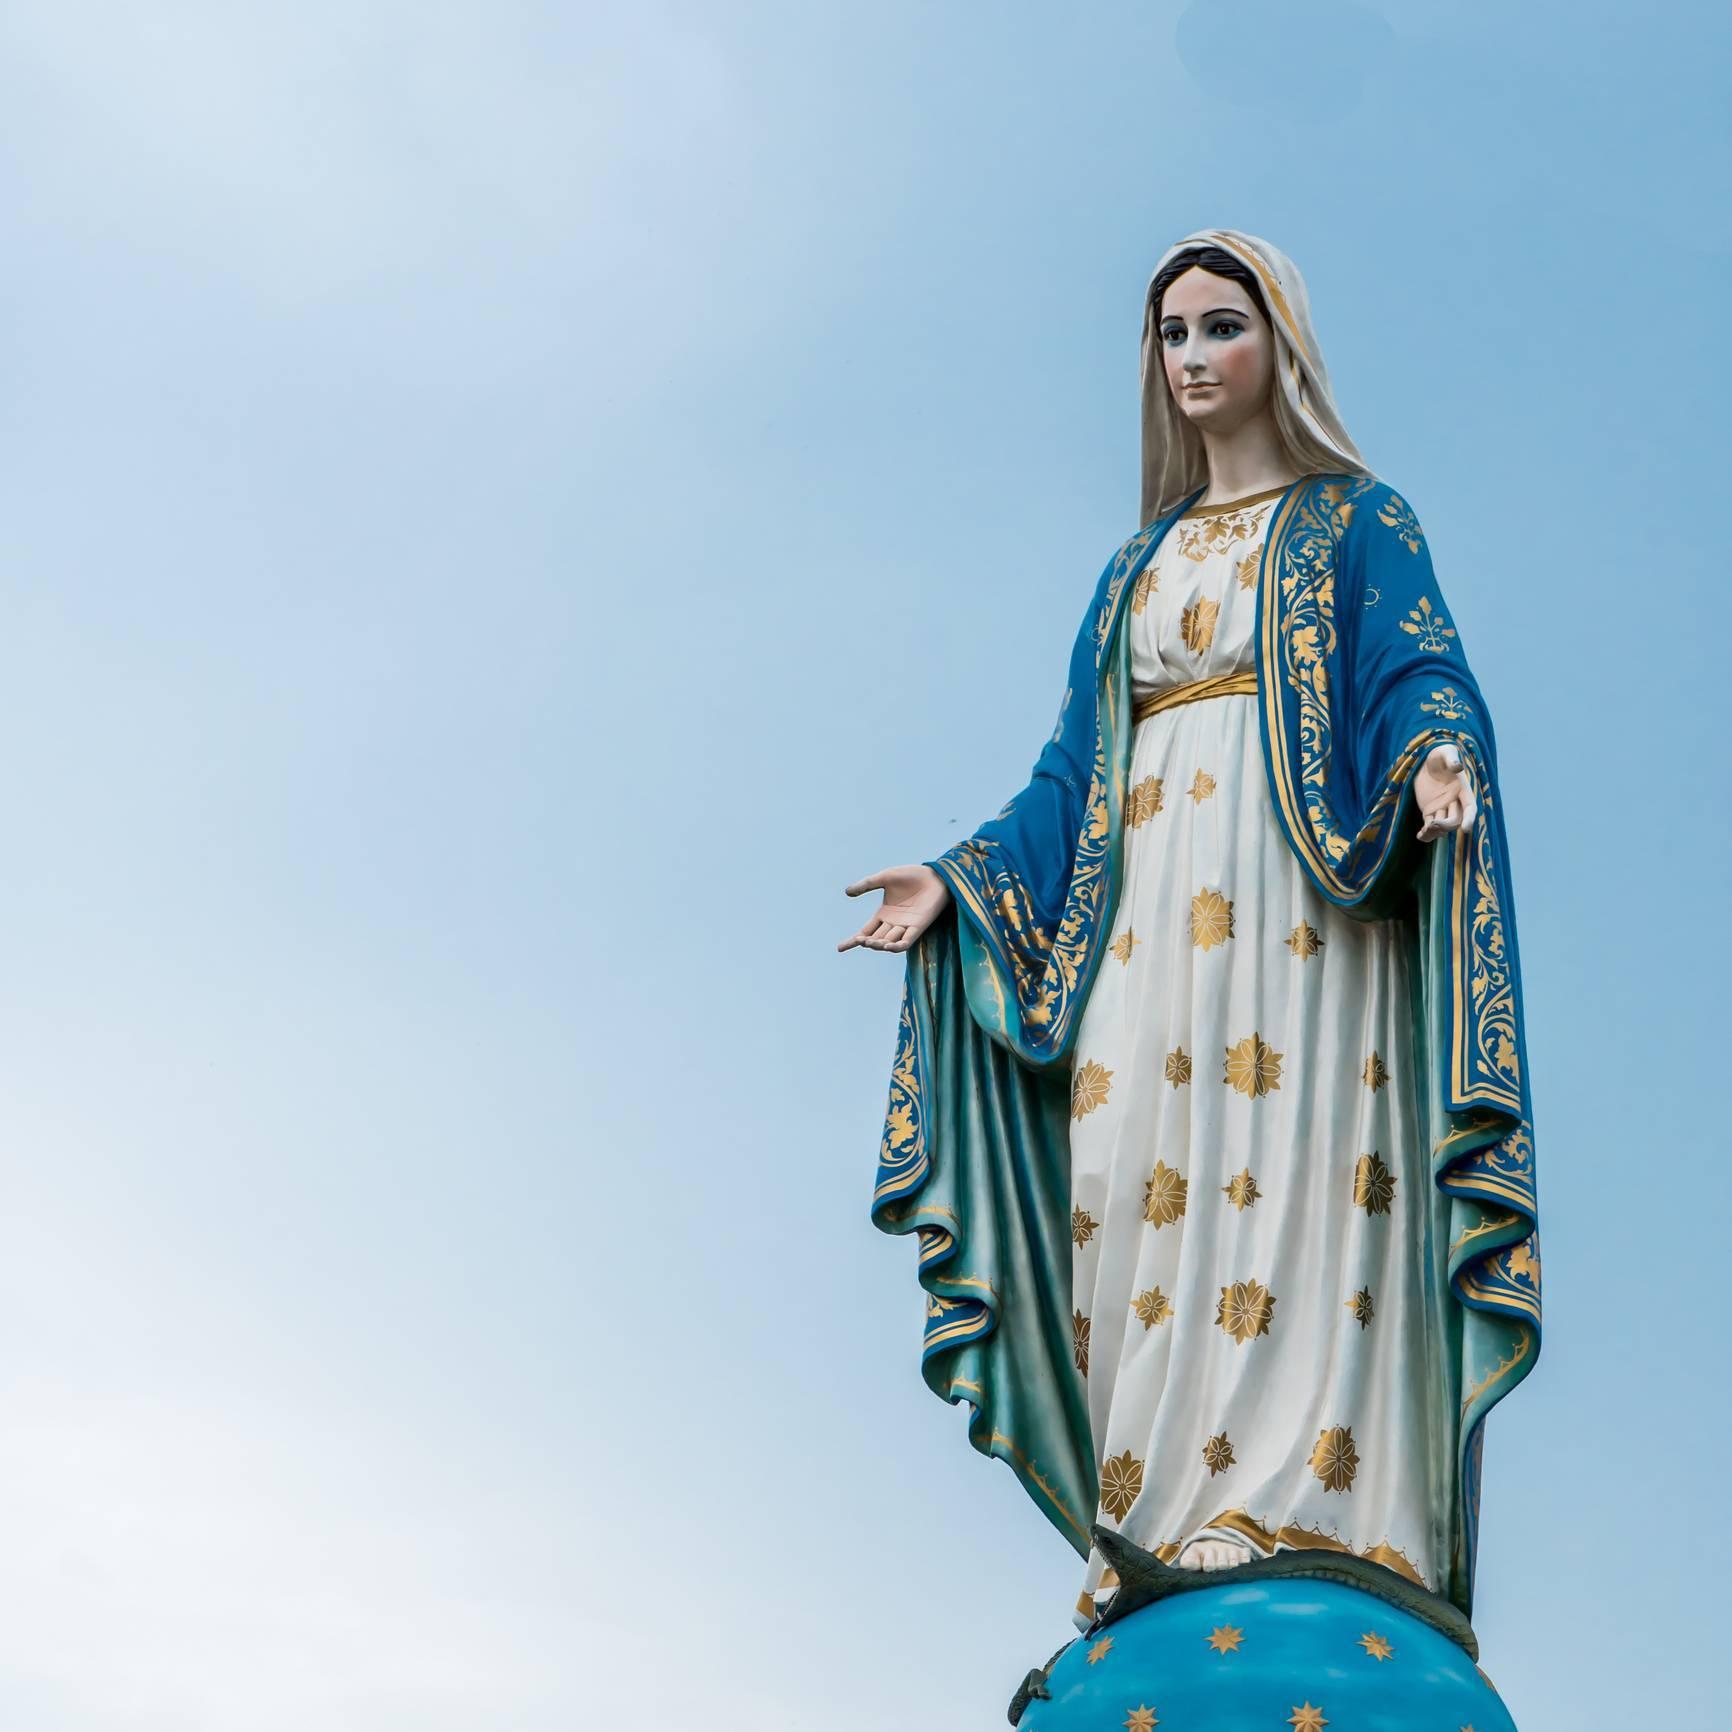 statue Sainte Vierge Marie